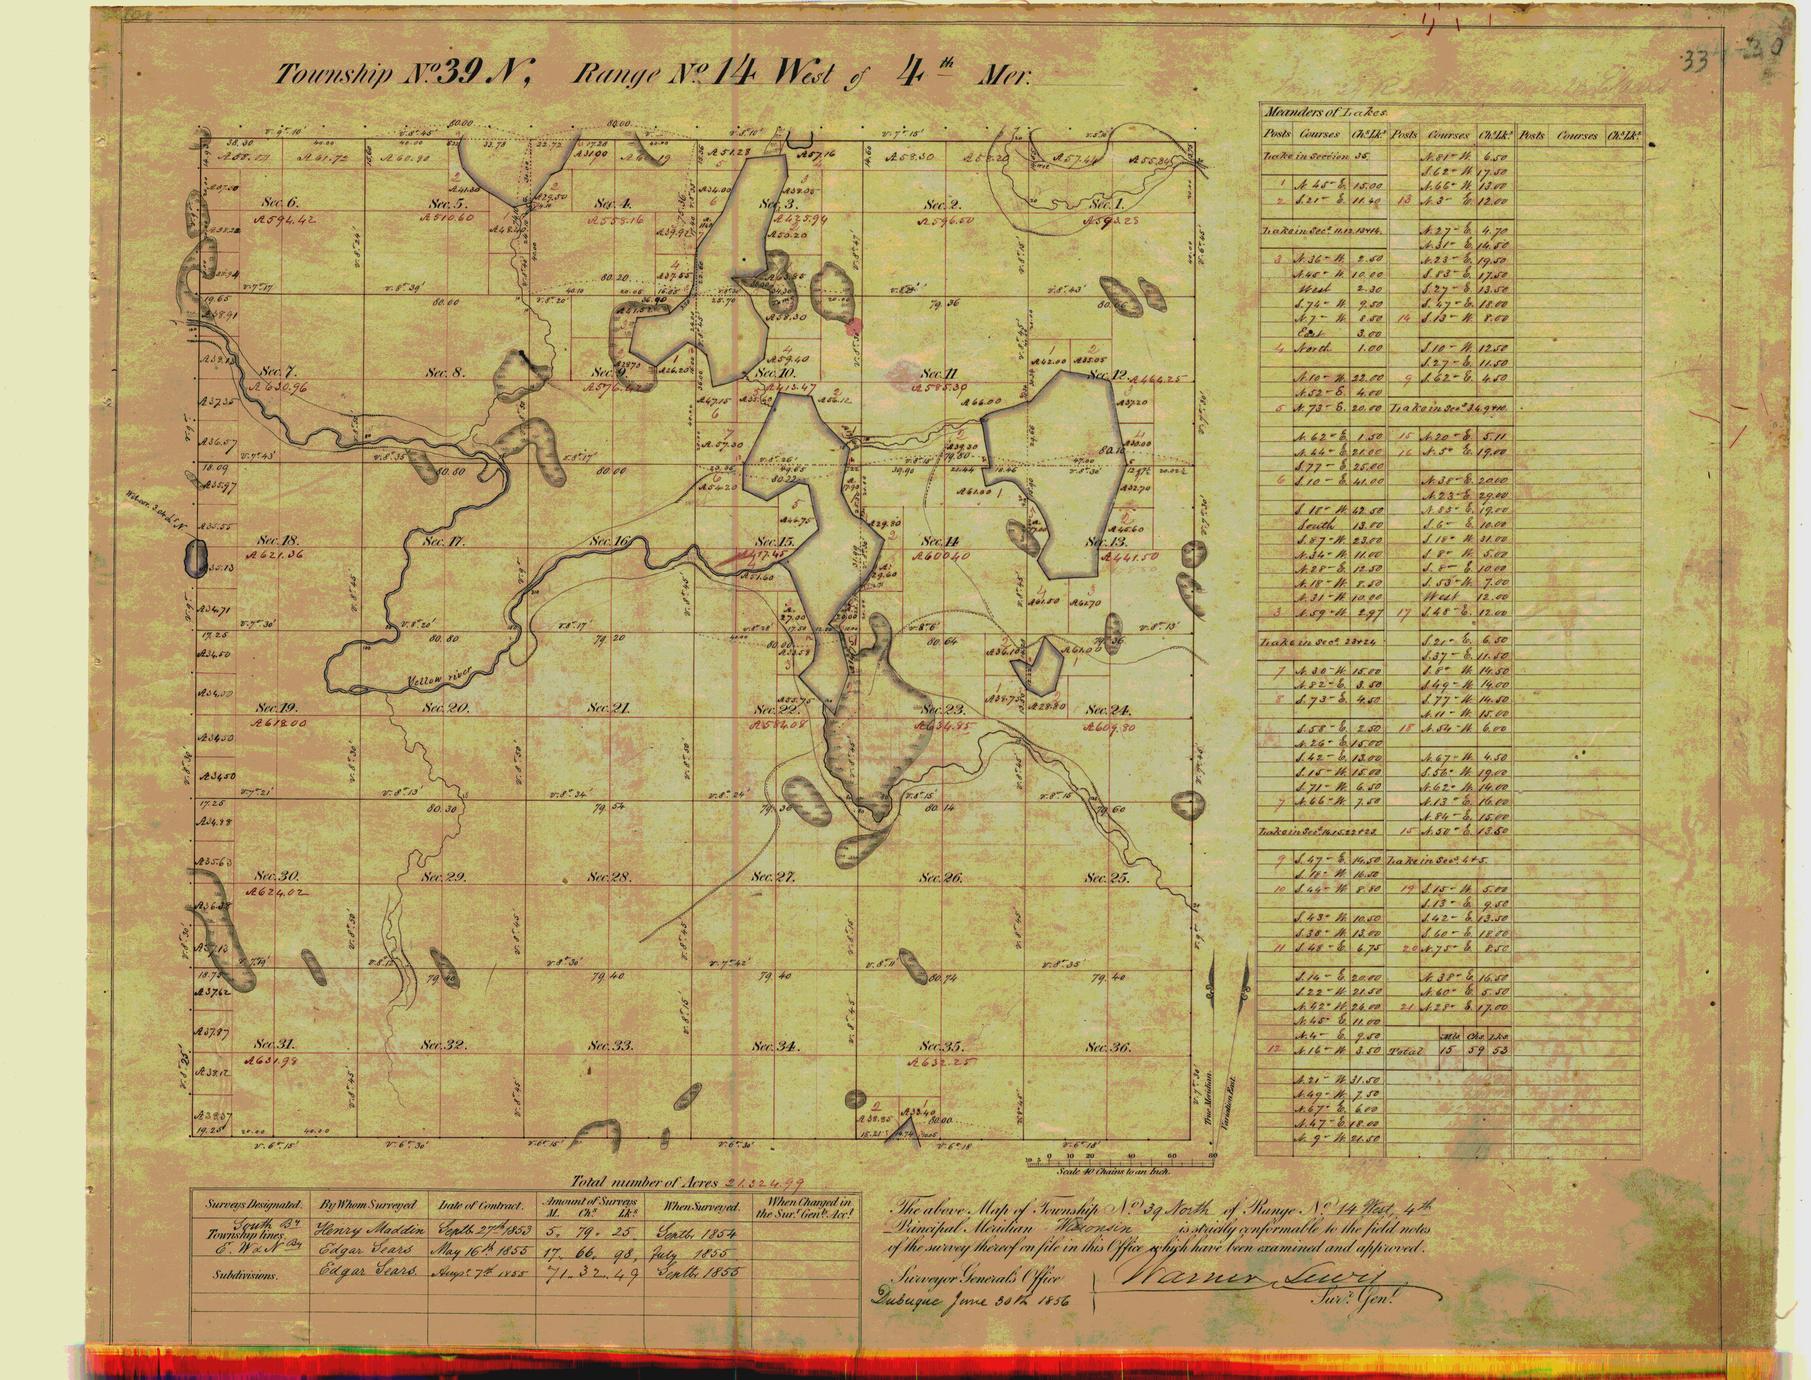 [Public Land Survey System map: Wisconsin Township 39 North, Range 14 West]